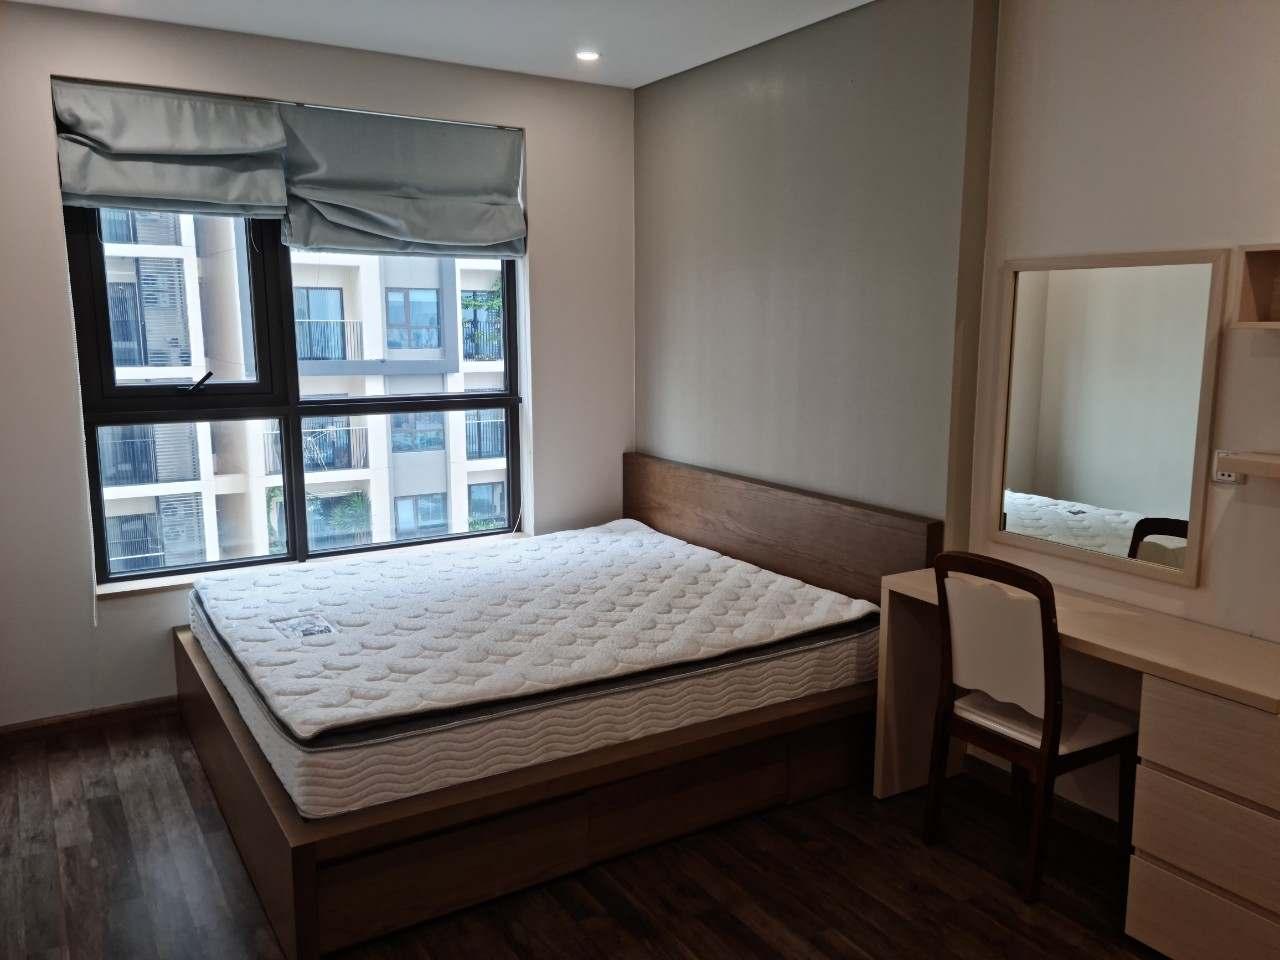 Phòng ngủ 2 căn hộ Hado Centrosa